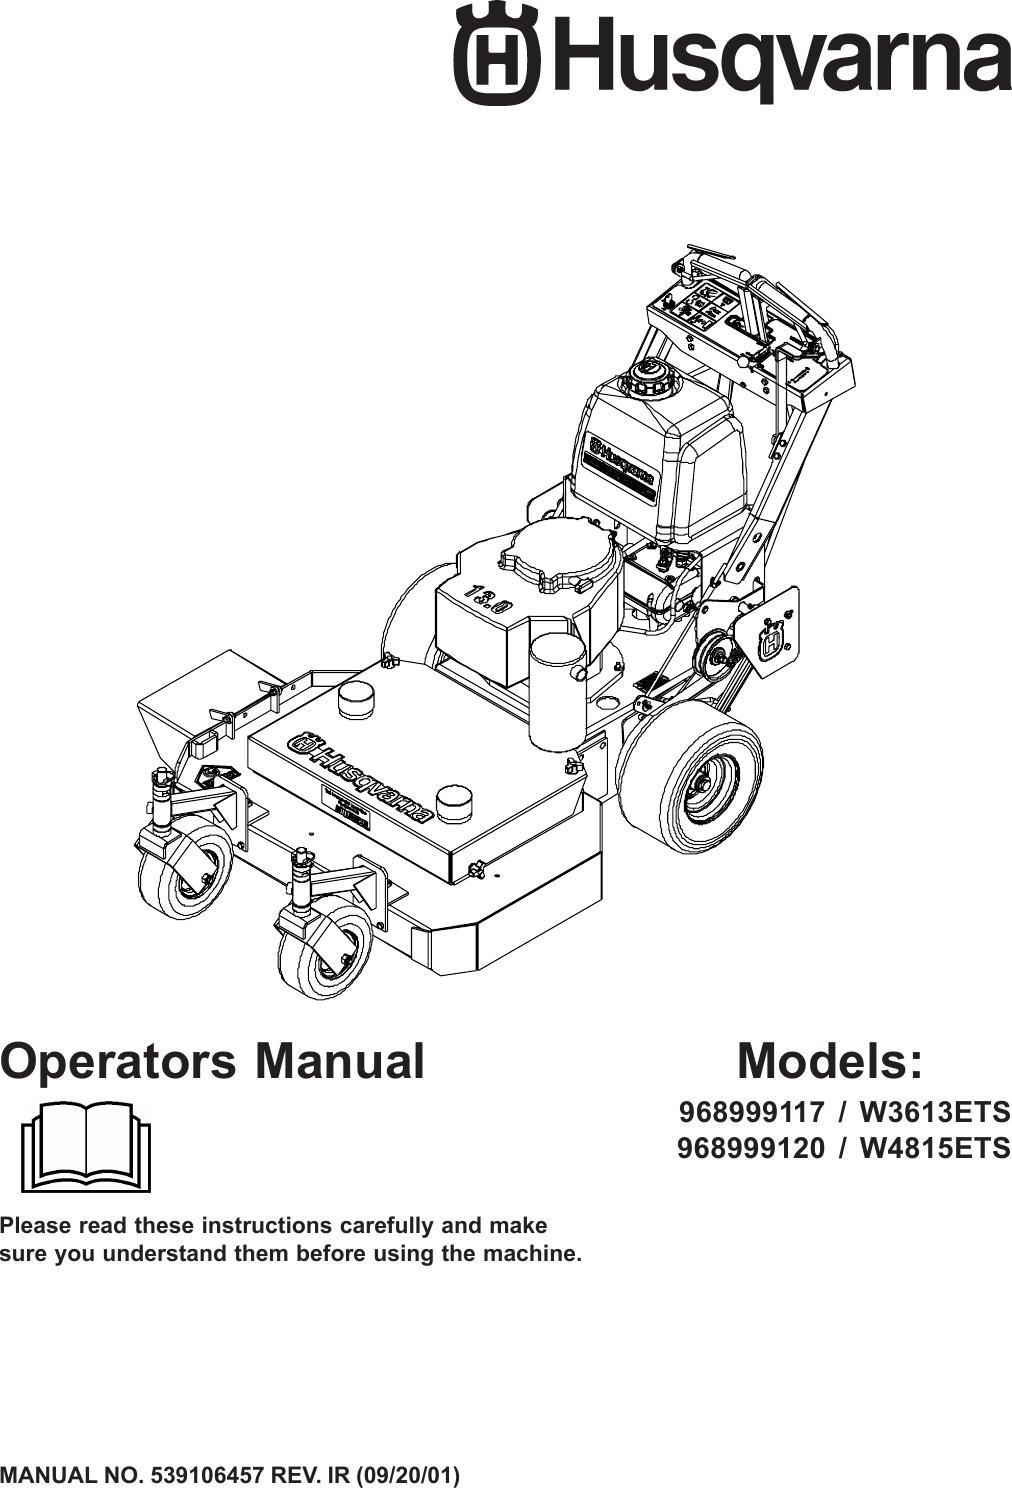 Husqvarna W3613Ets W4815Ets Users Manual OM, W 3613 ETS